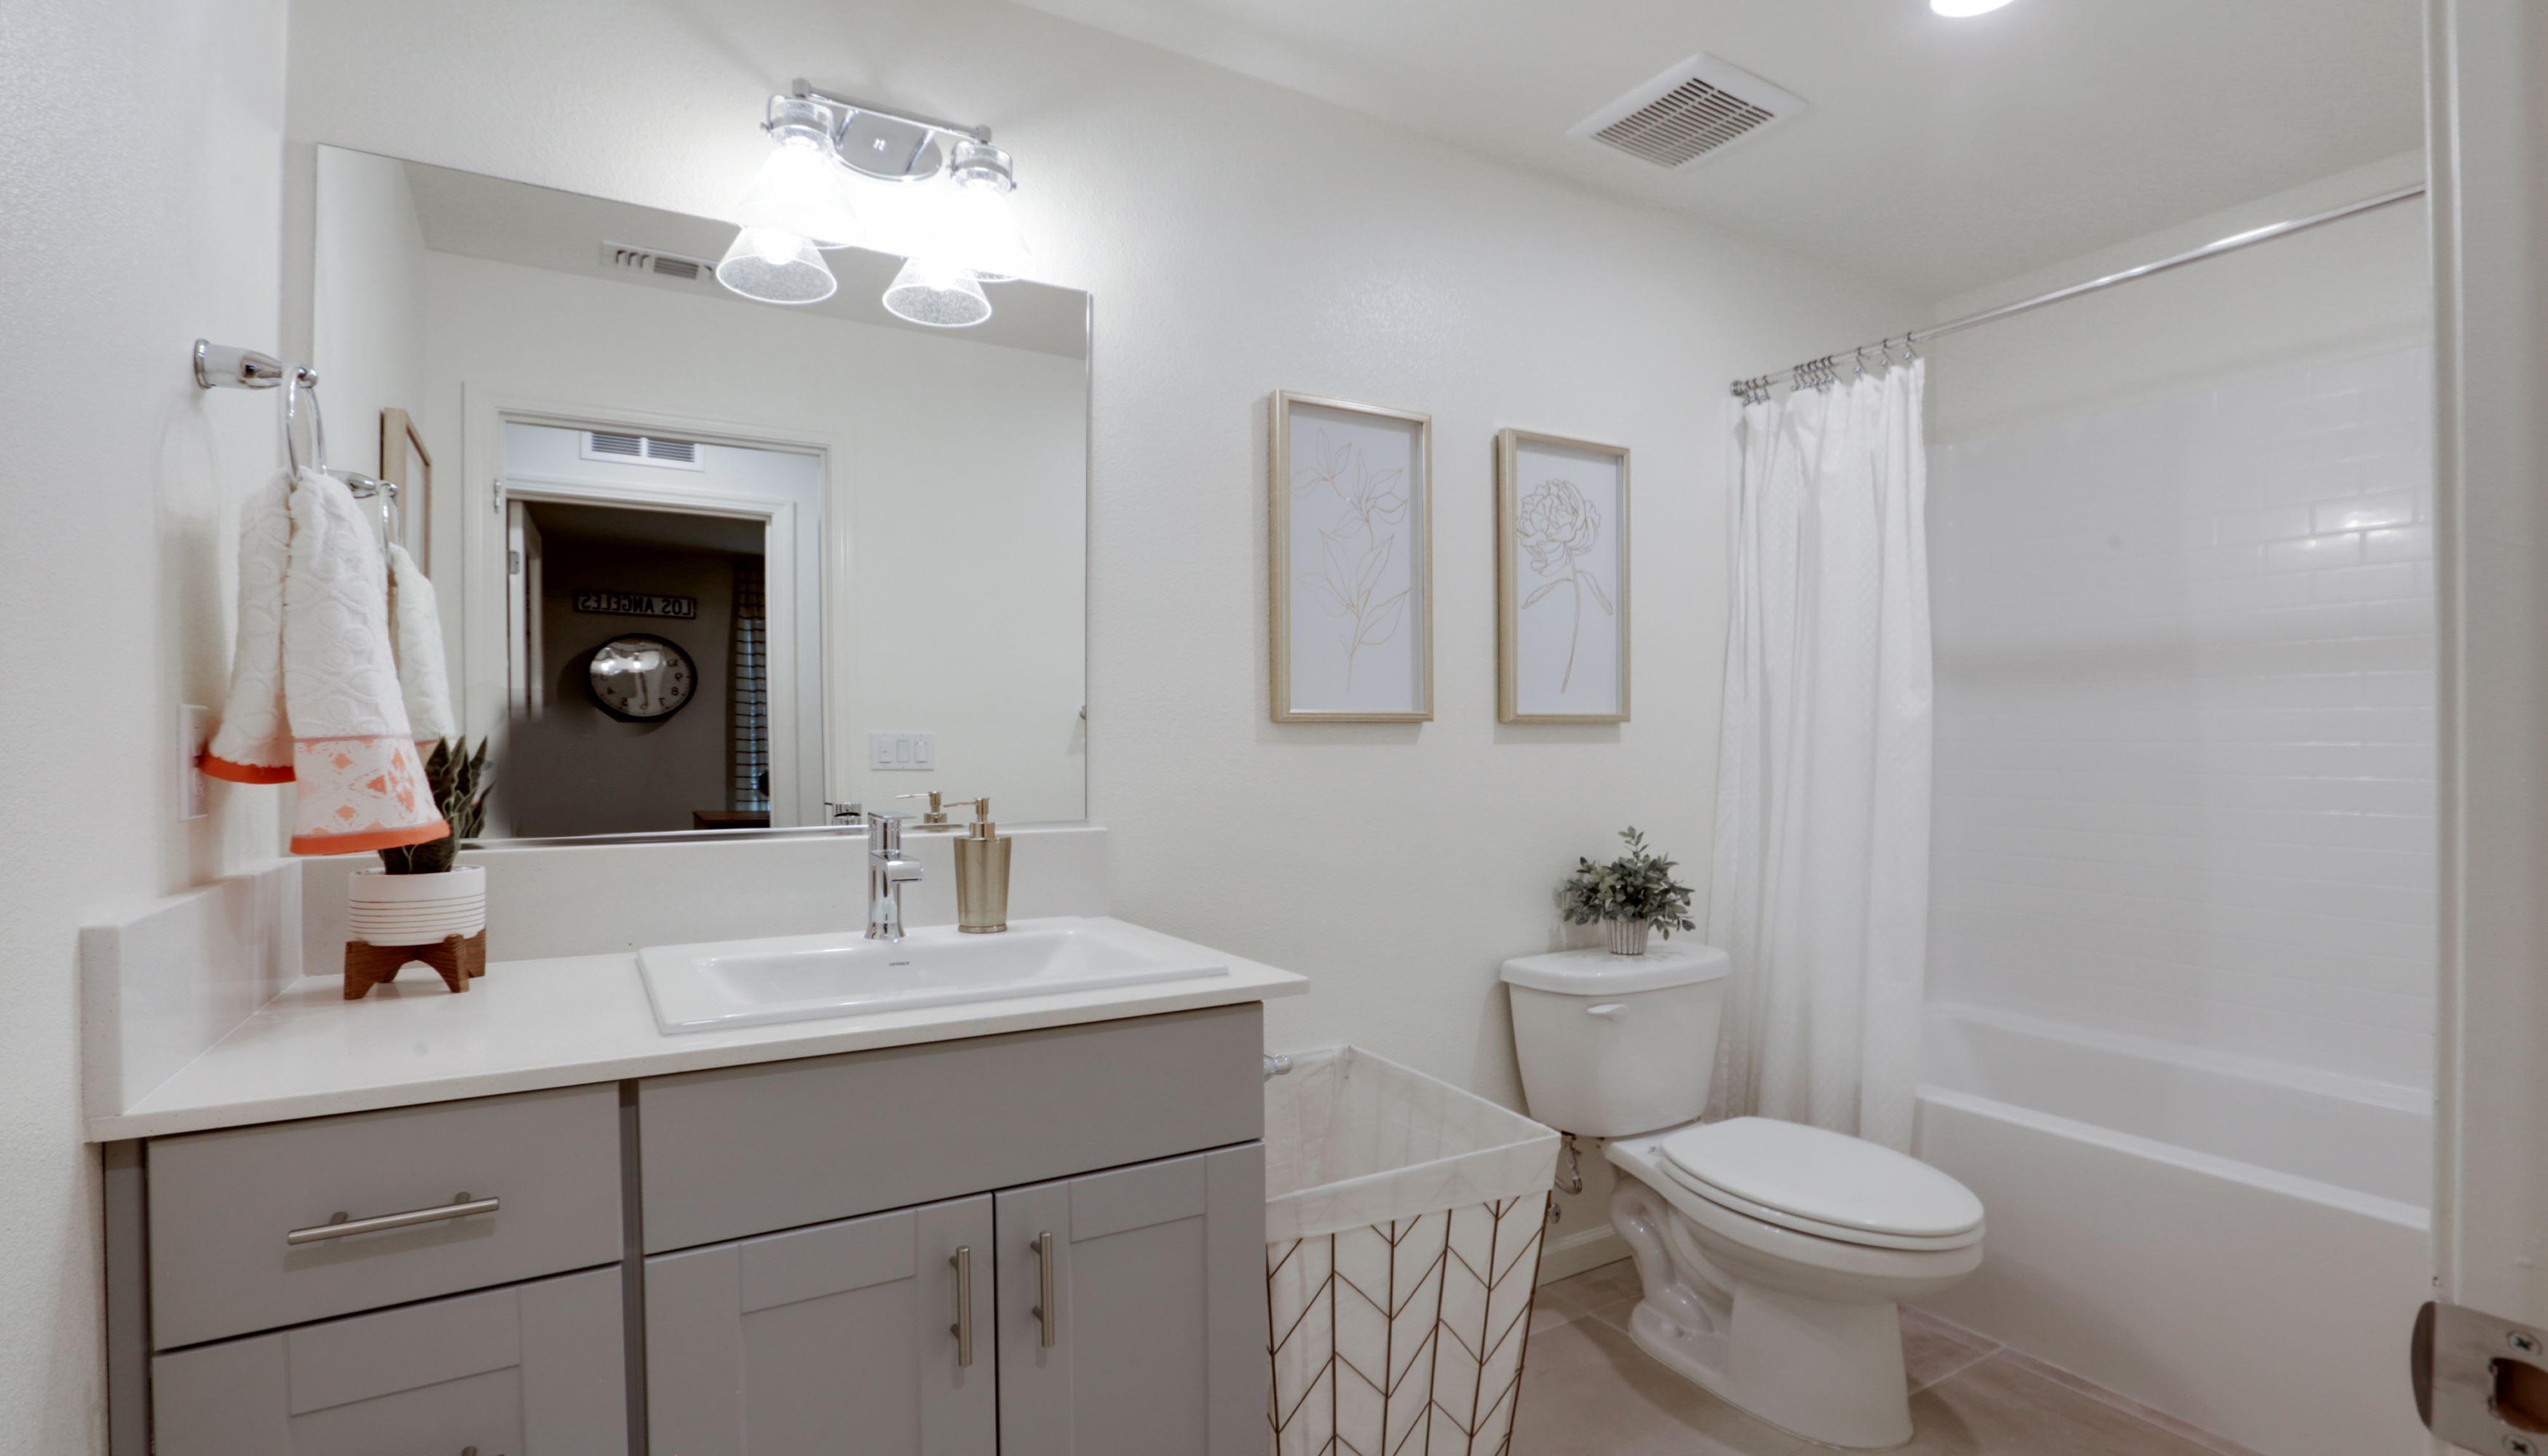 Bathroom featured in the Monroe By D.R. Horton in Visalia, CA